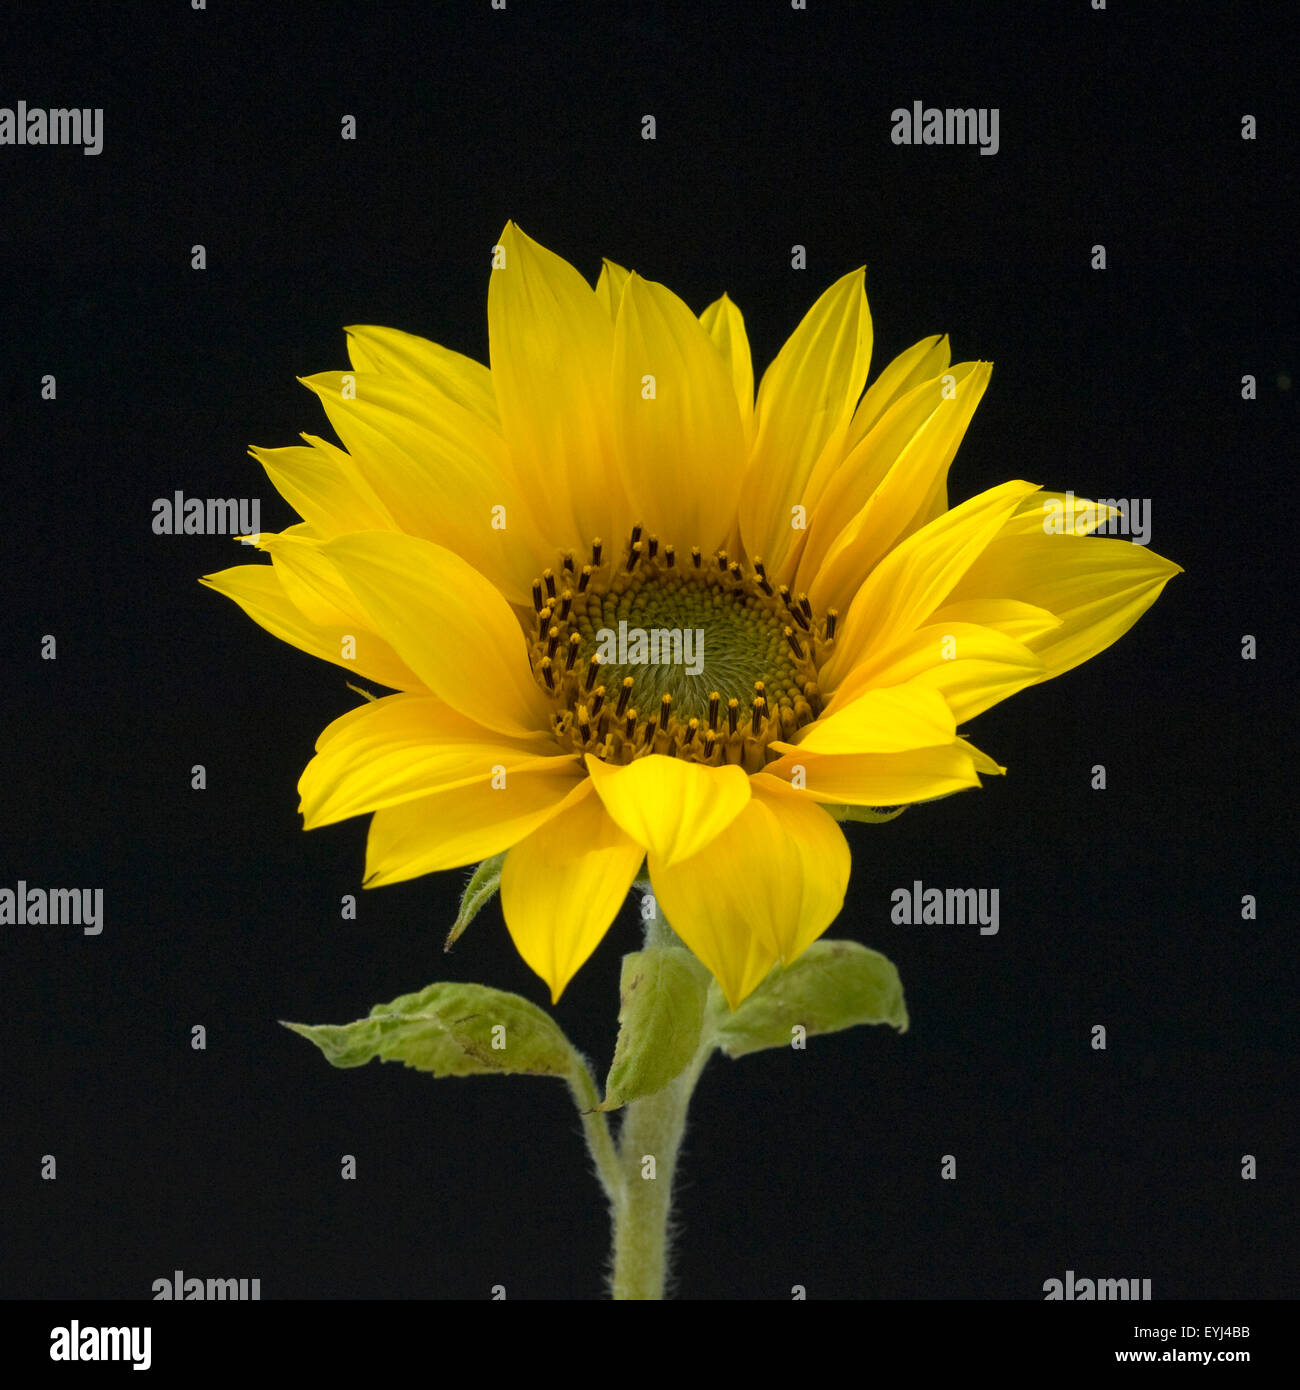 Sonnenblume, Helianthus annuus, Oelpflanze, Energiepflanze, Biomasse, Energiepflanzen, Biogener Brennstoff, Industriepflanzen, - Stock Image